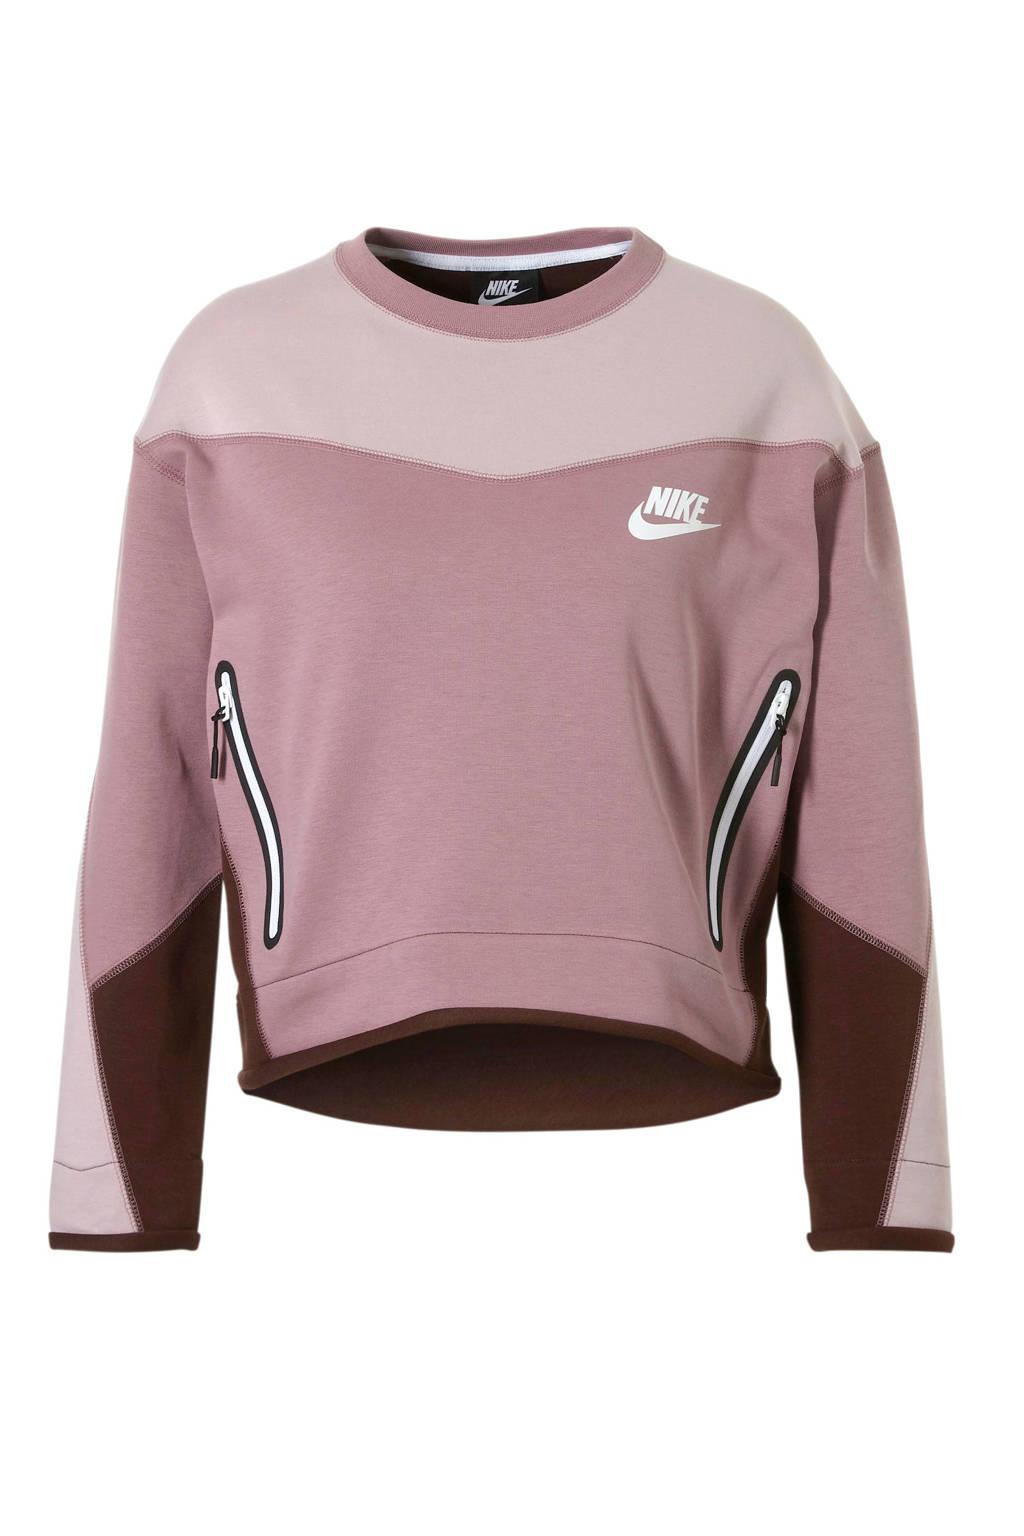 Nikesweater Oudroze Oudroze paars Oudroze paars Oudroze paars Nikesweater paars Oudroze Nikesweater Nikesweater paars Nikesweater IXw1nq8x6A